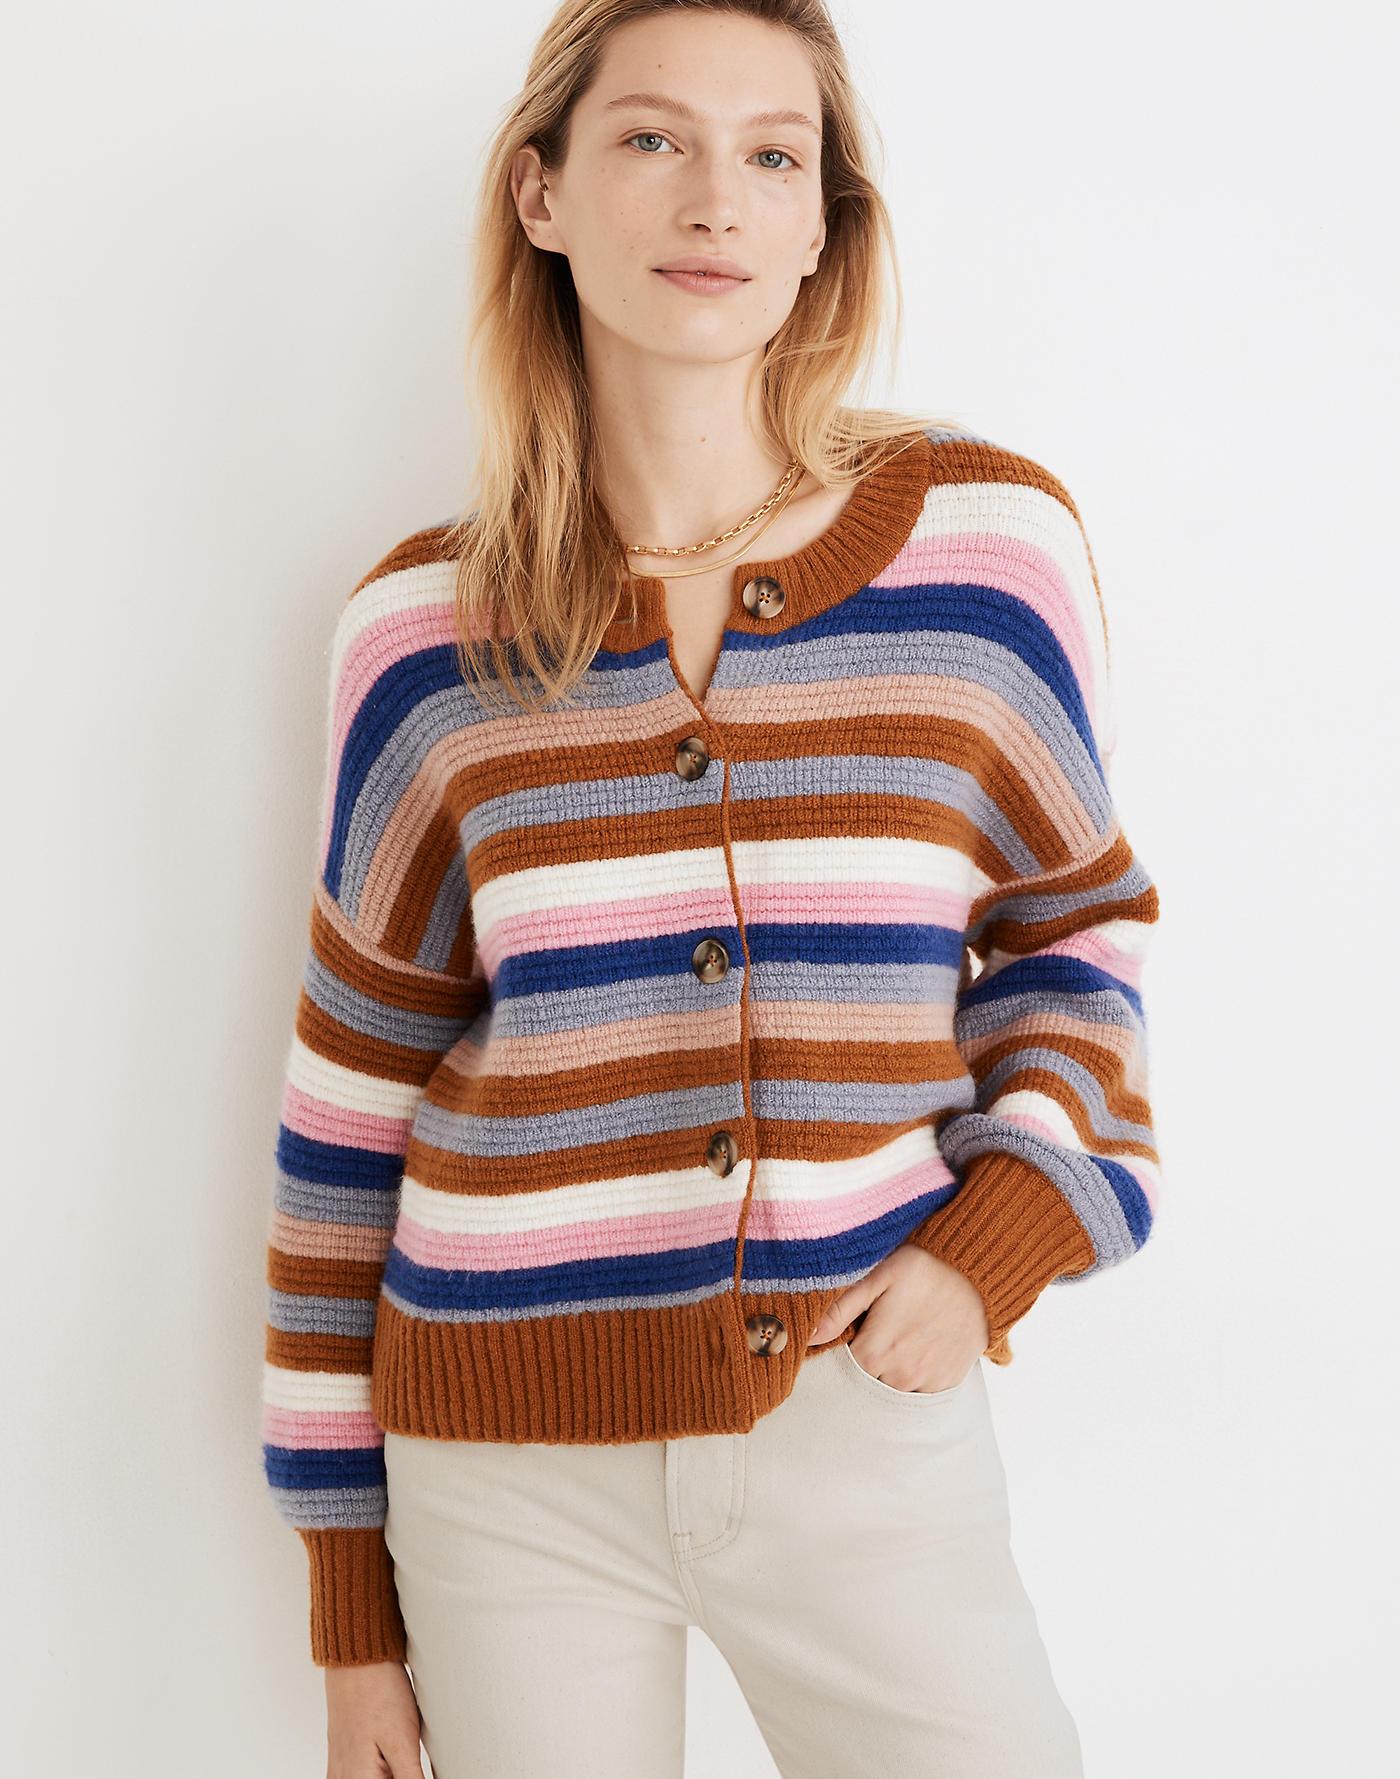 Madewell Striped Springview Cardigan Sweater in Coziest Yarn